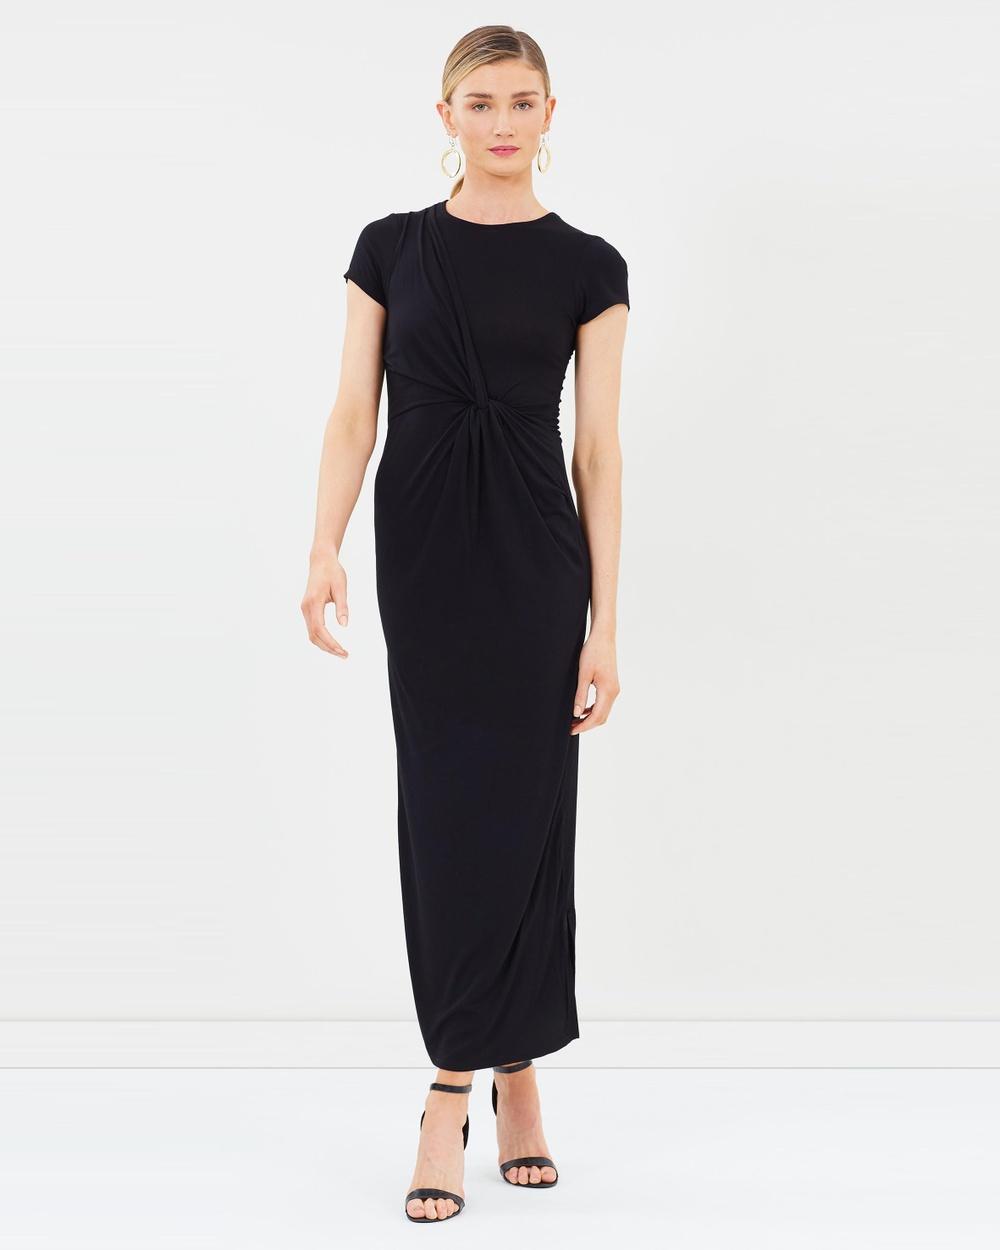 Dorothy Perkins Jersey Knot Maxi Dress Dresses Black Jersey Knot Maxi Dress